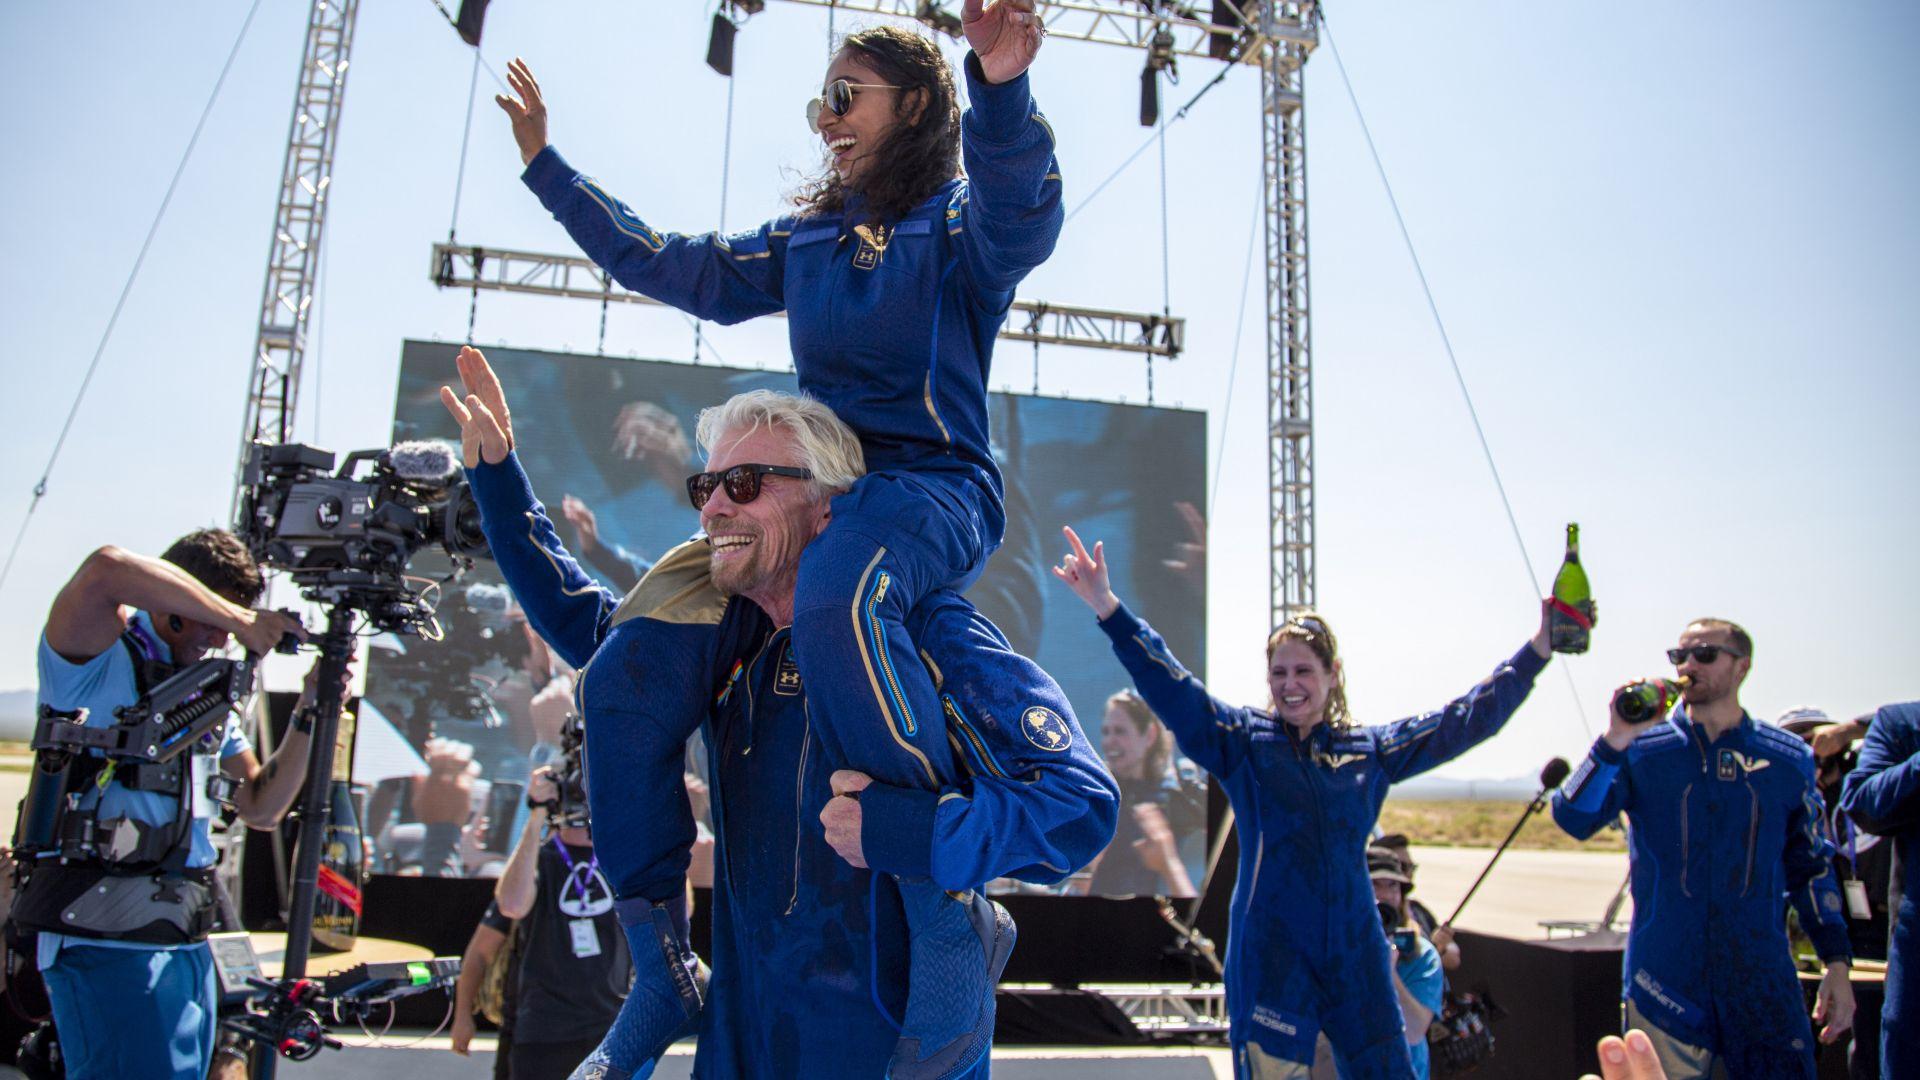 Джеф Безос и Илон Мъск поздравиха Ричард Брансън за успешния полет до космоса